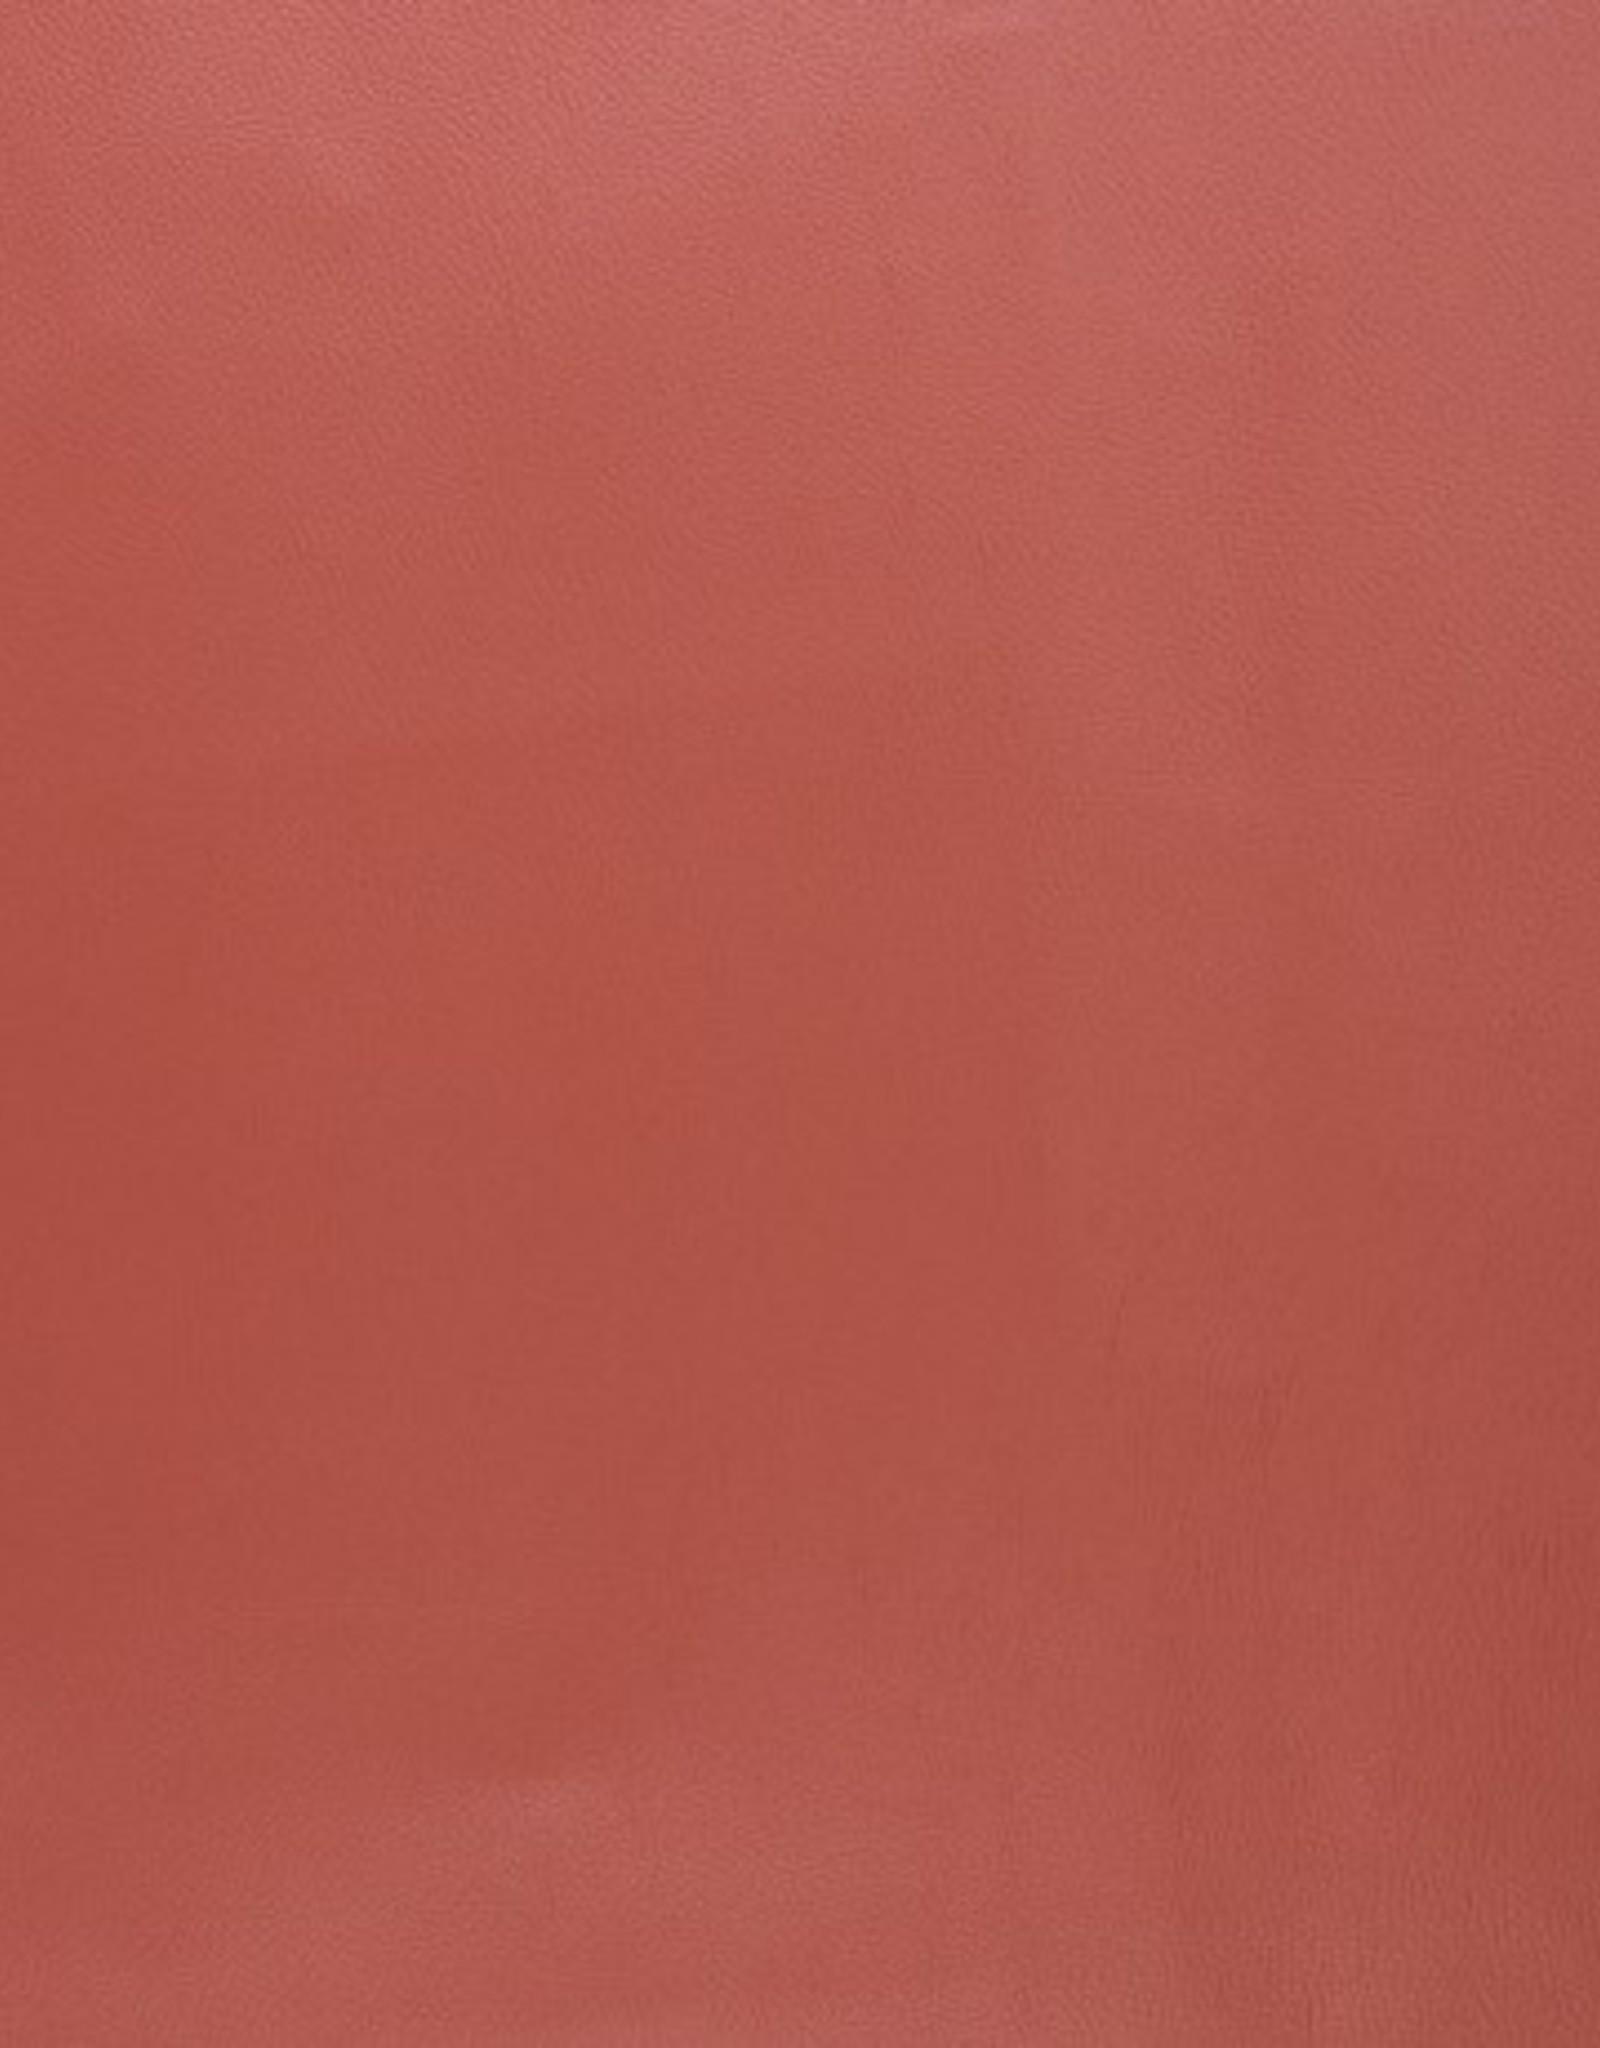 Faux leather metallic blood orange